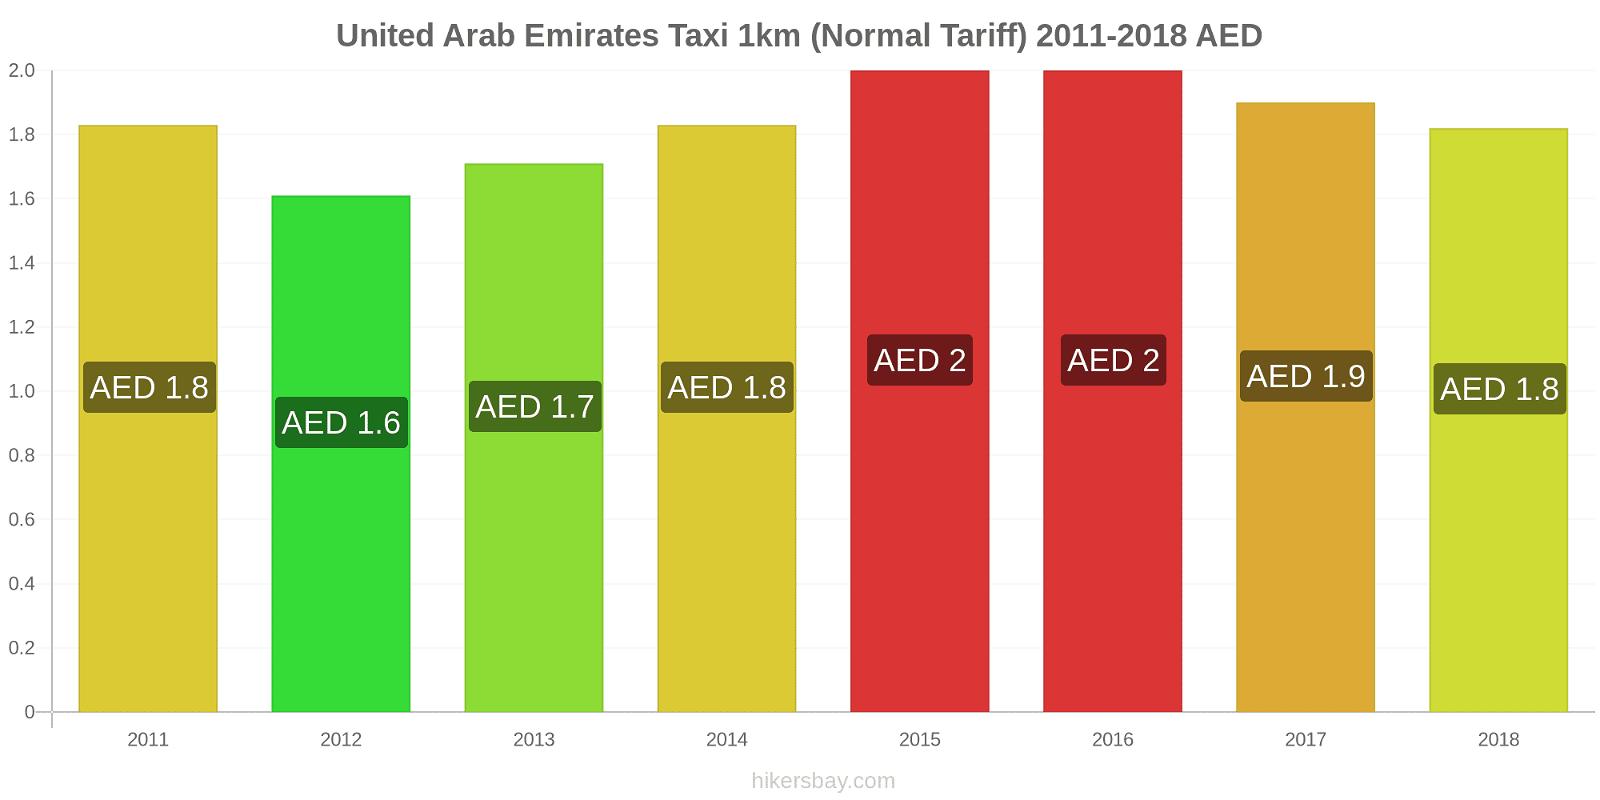 United Arab Emirates price changes Taxi 1km (Normal Tariff) hikersbay.com